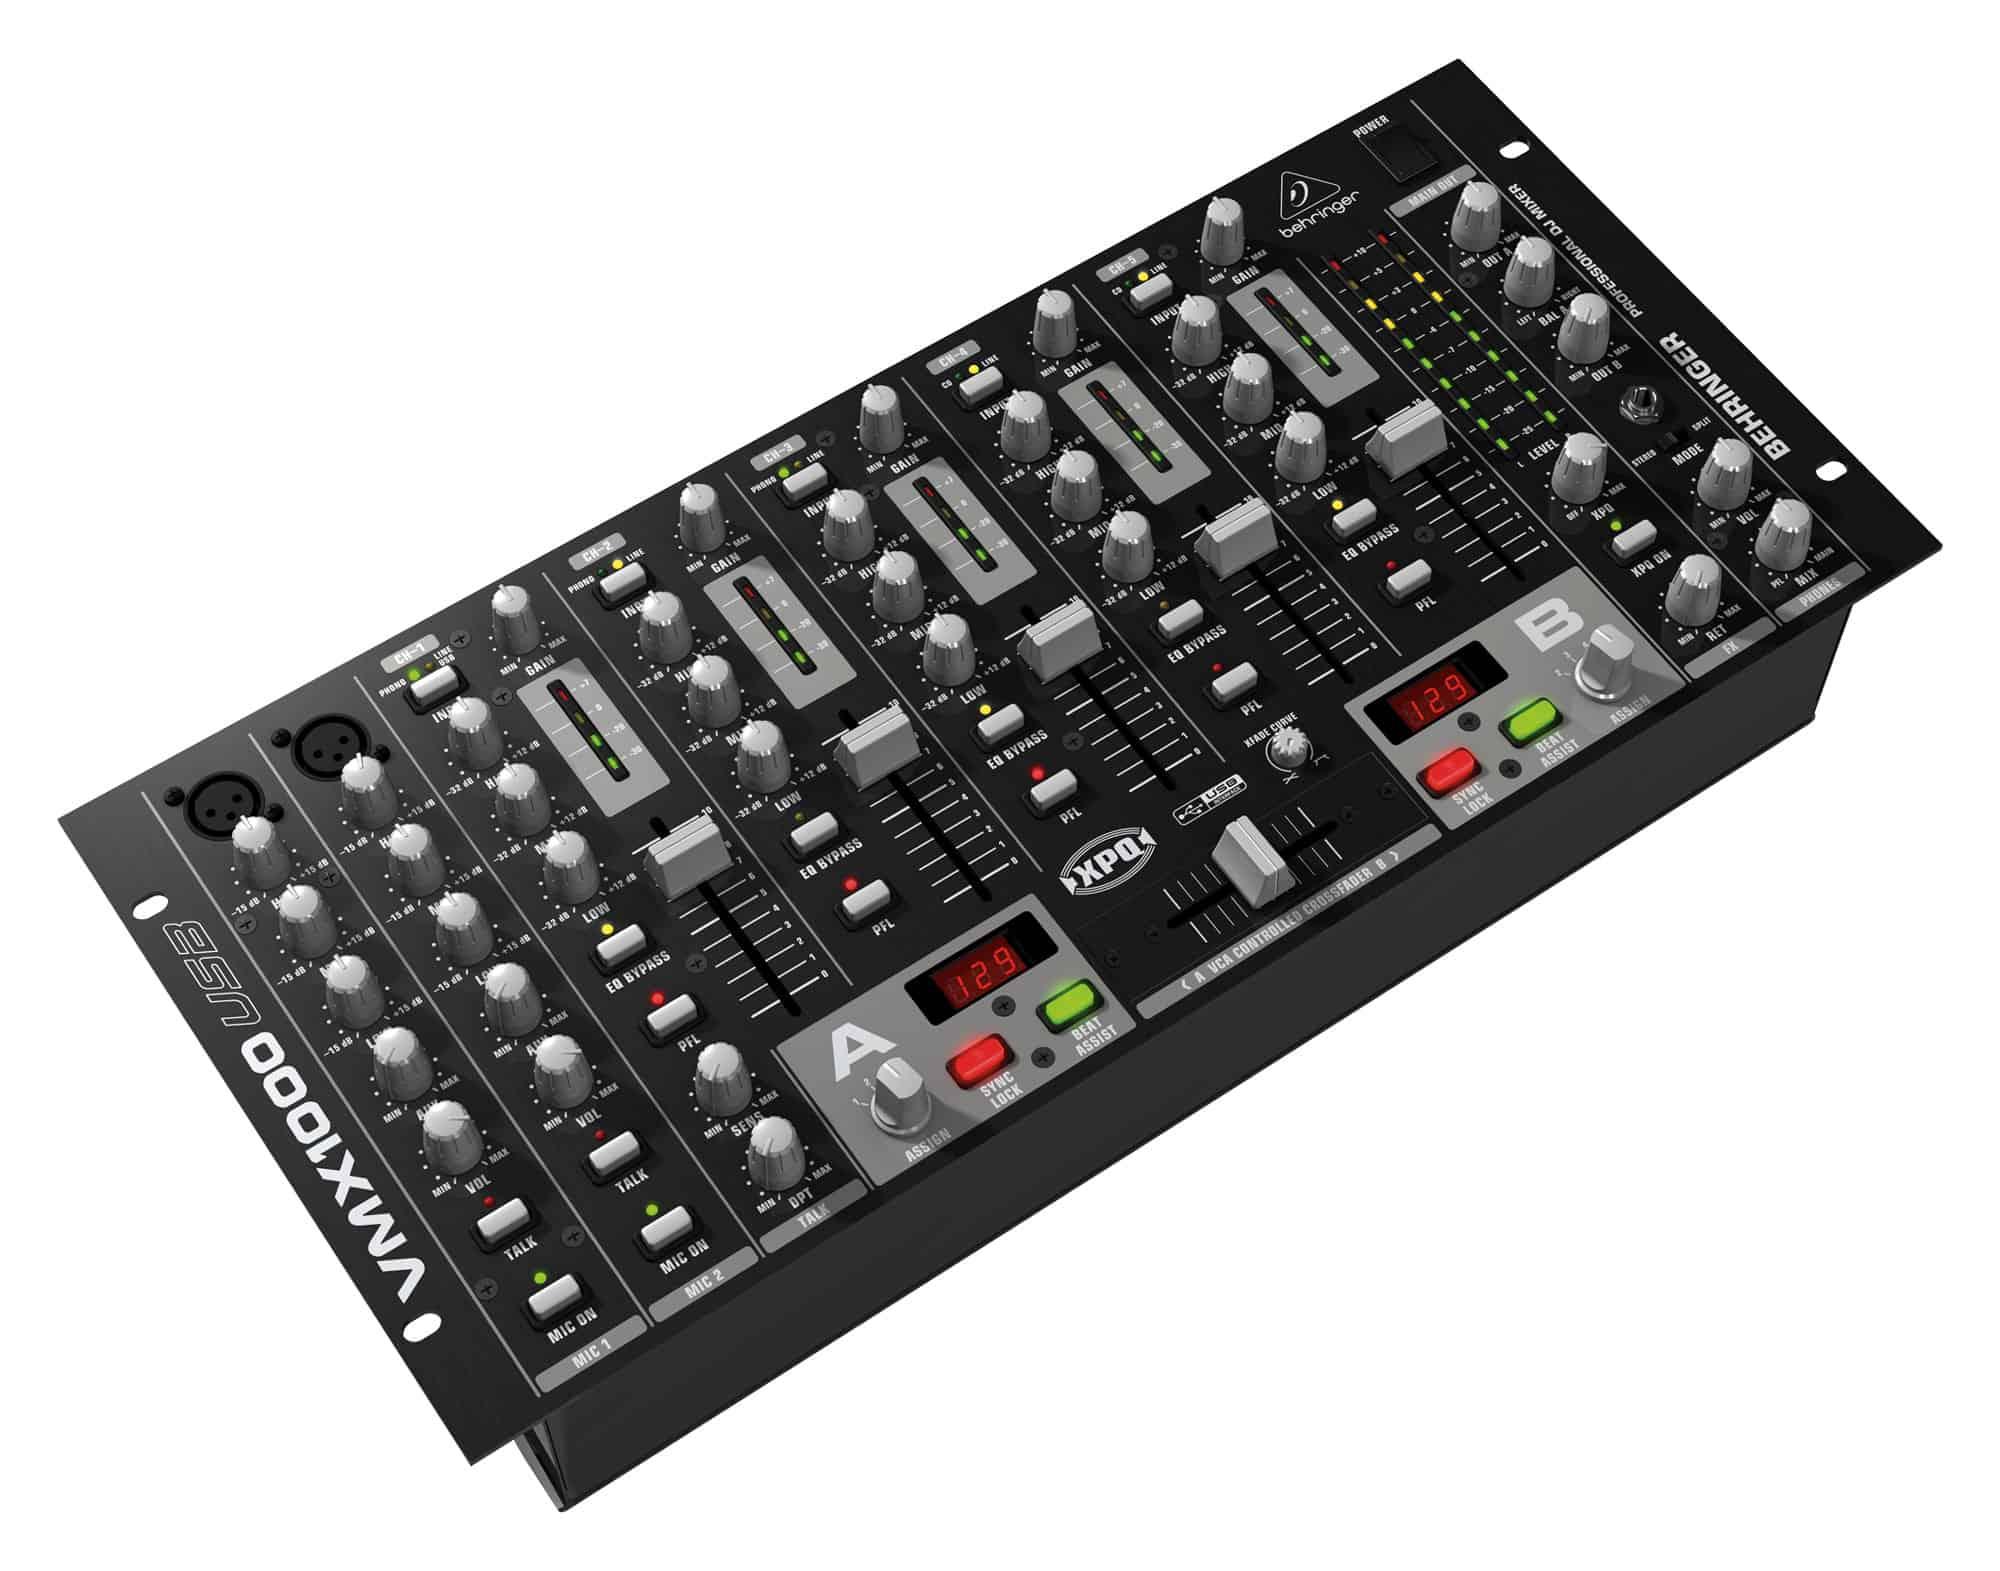 Djmixer - Behringer VMX1000 USB DJ Mixer - Onlineshop Musikhaus Kirstein